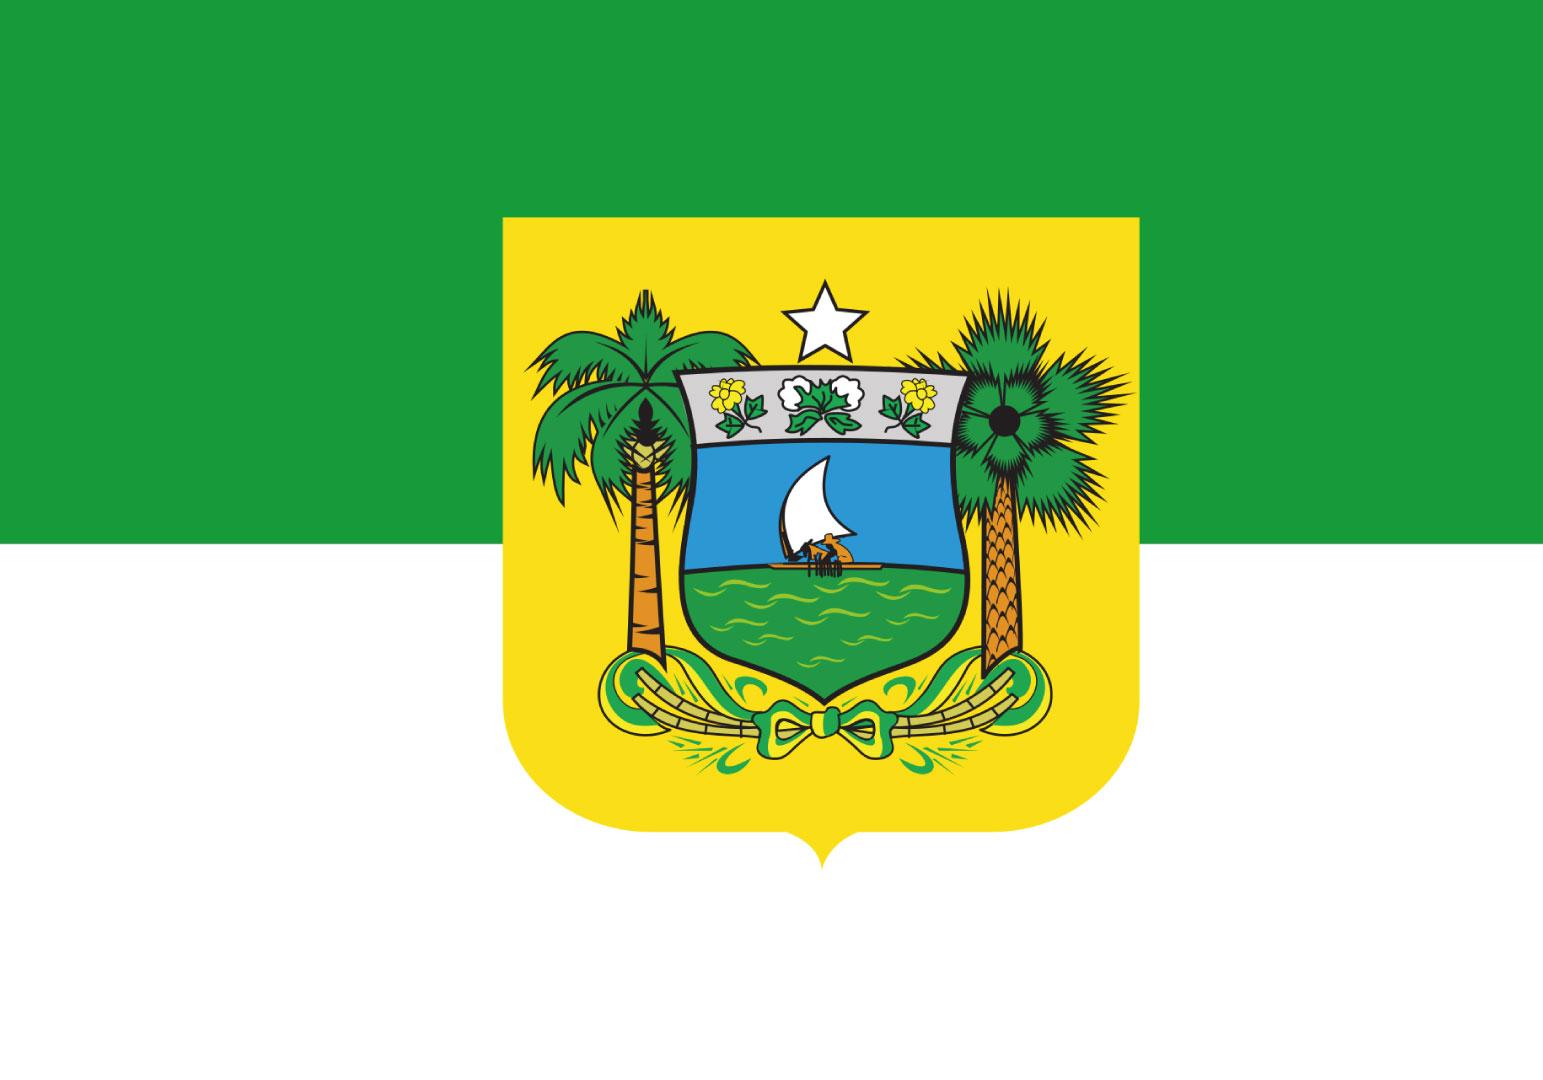 Sindicato dos C.F.C.s do Estado do Rio Grande do Norte